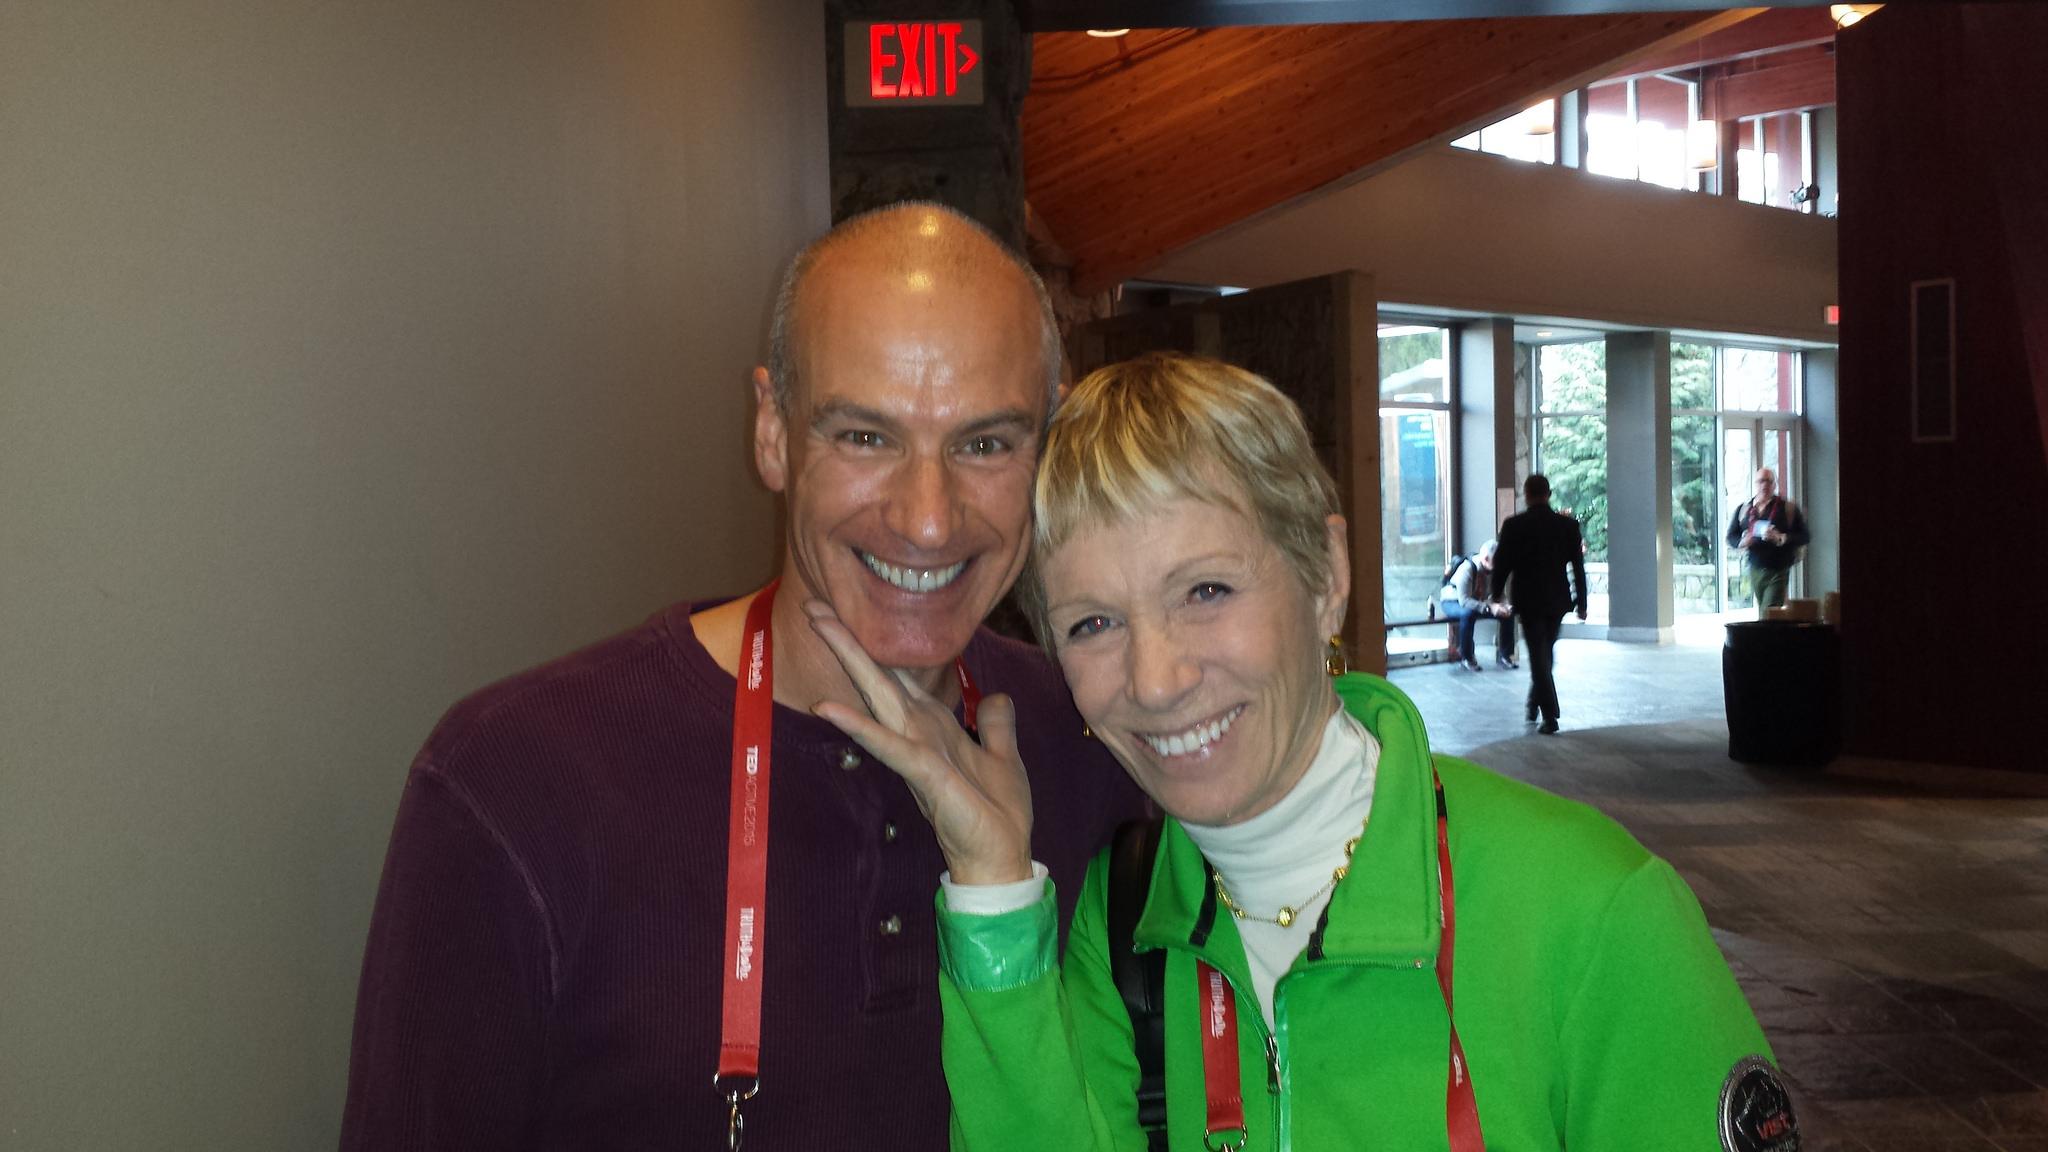 TEDxLancaster Executive Director Bob Vasile with real estate mogul Barbara Corcoran of ABC's Shark Tank at TEDActive 2015 in Whistler, BC